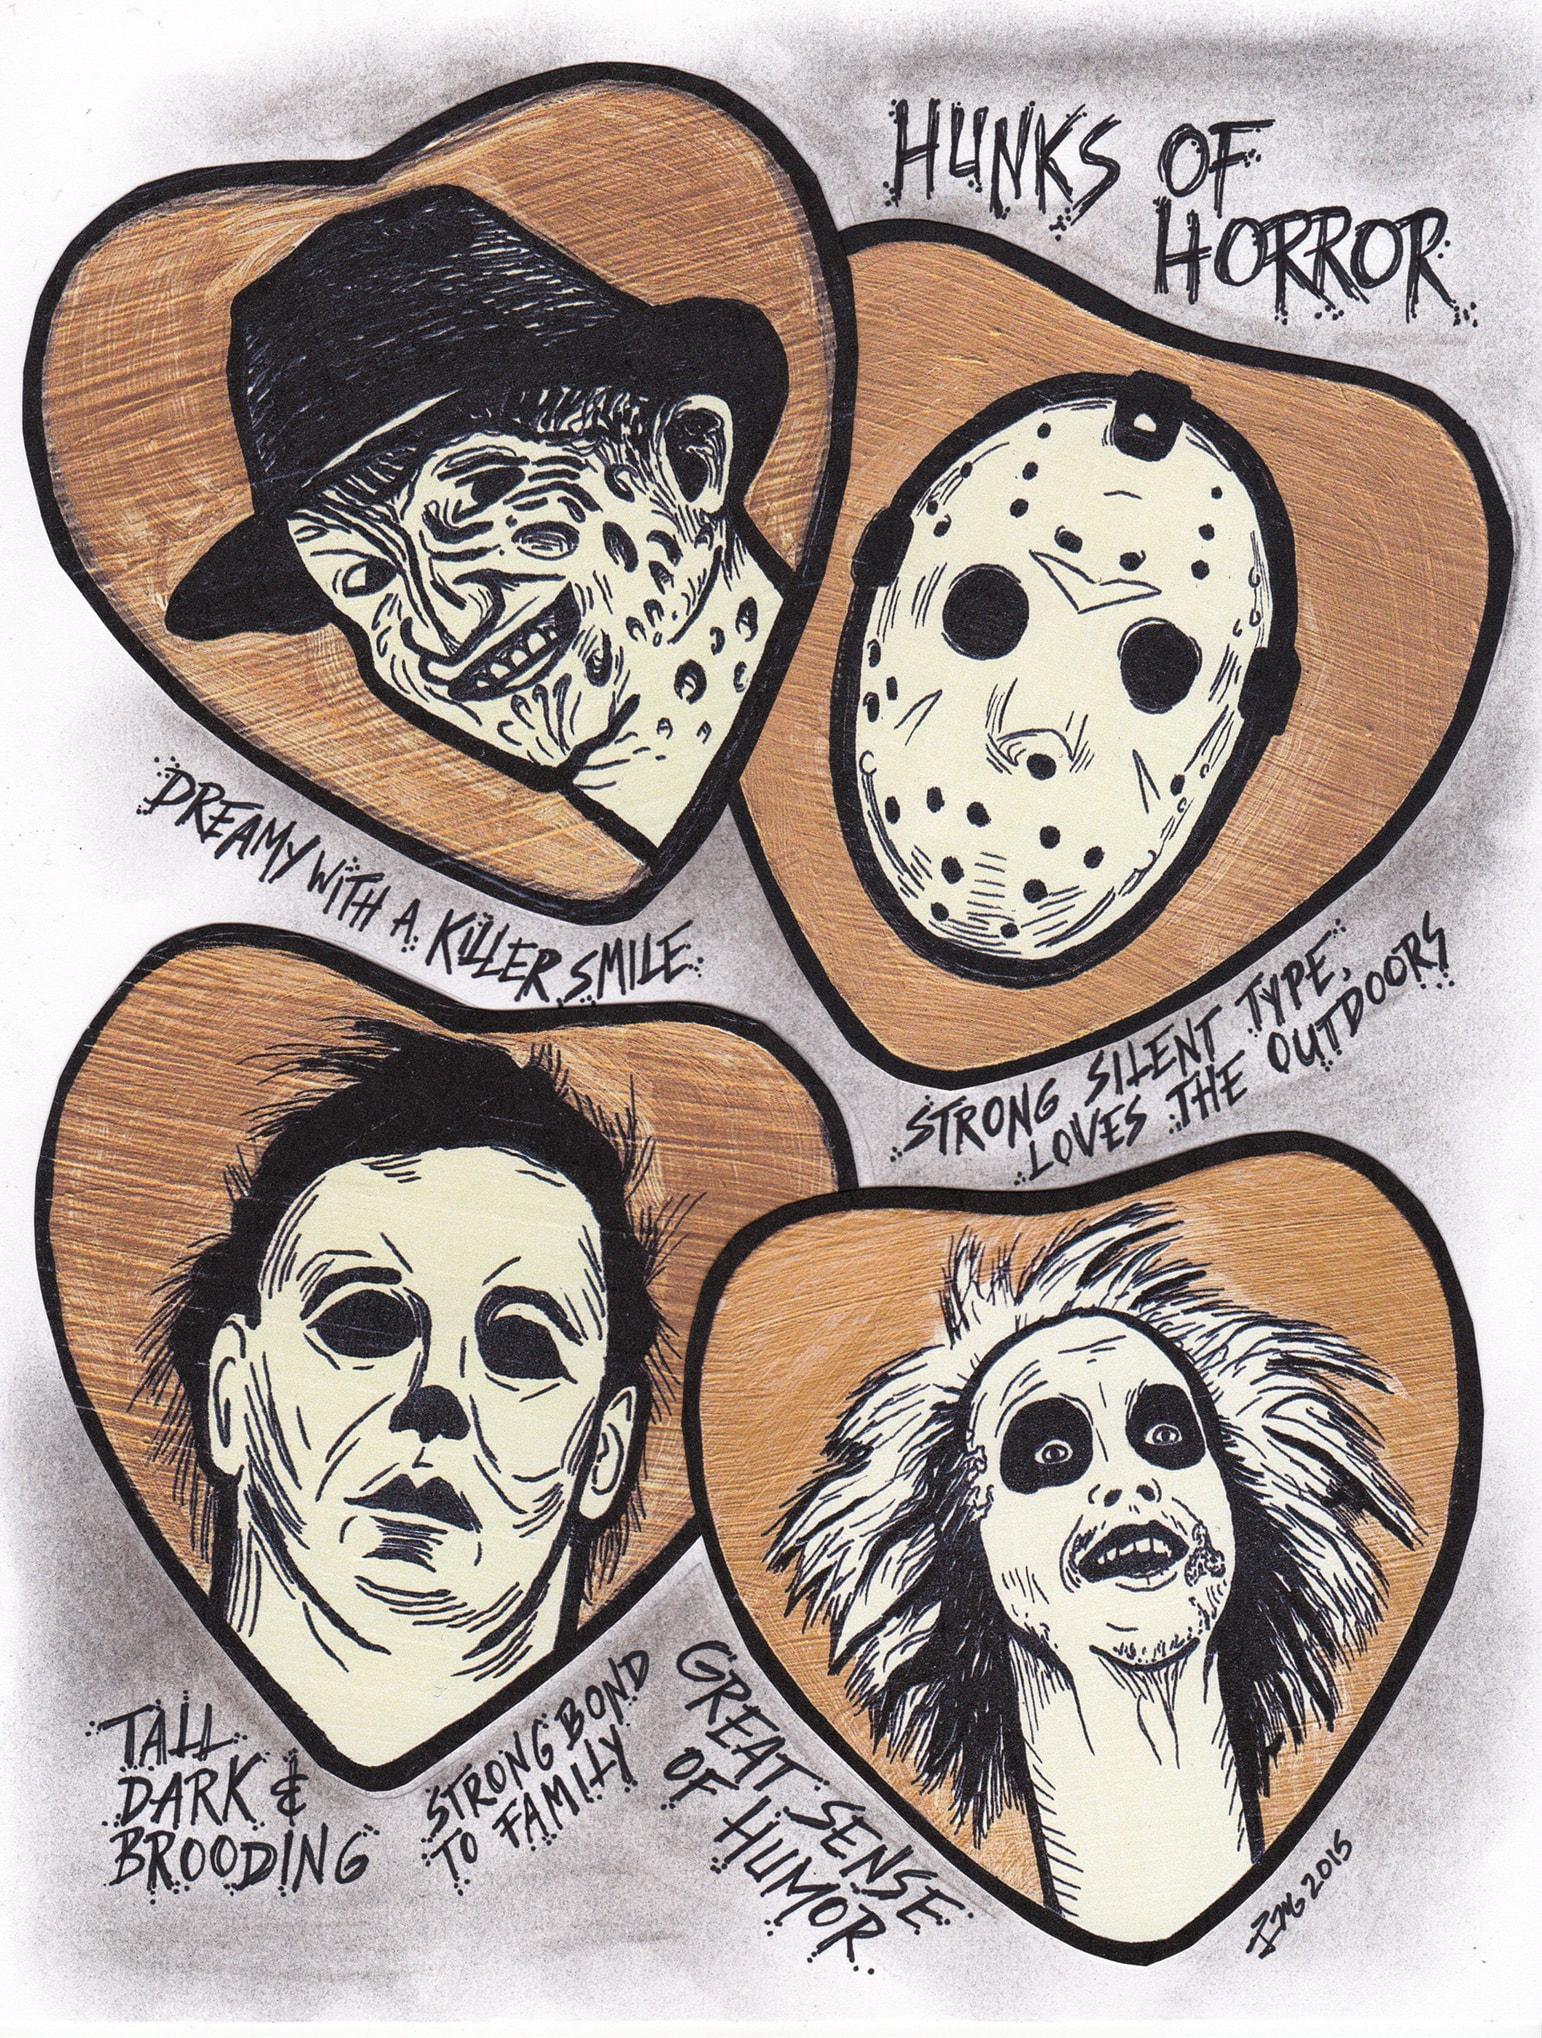 Sinisters Hunks of Horror print